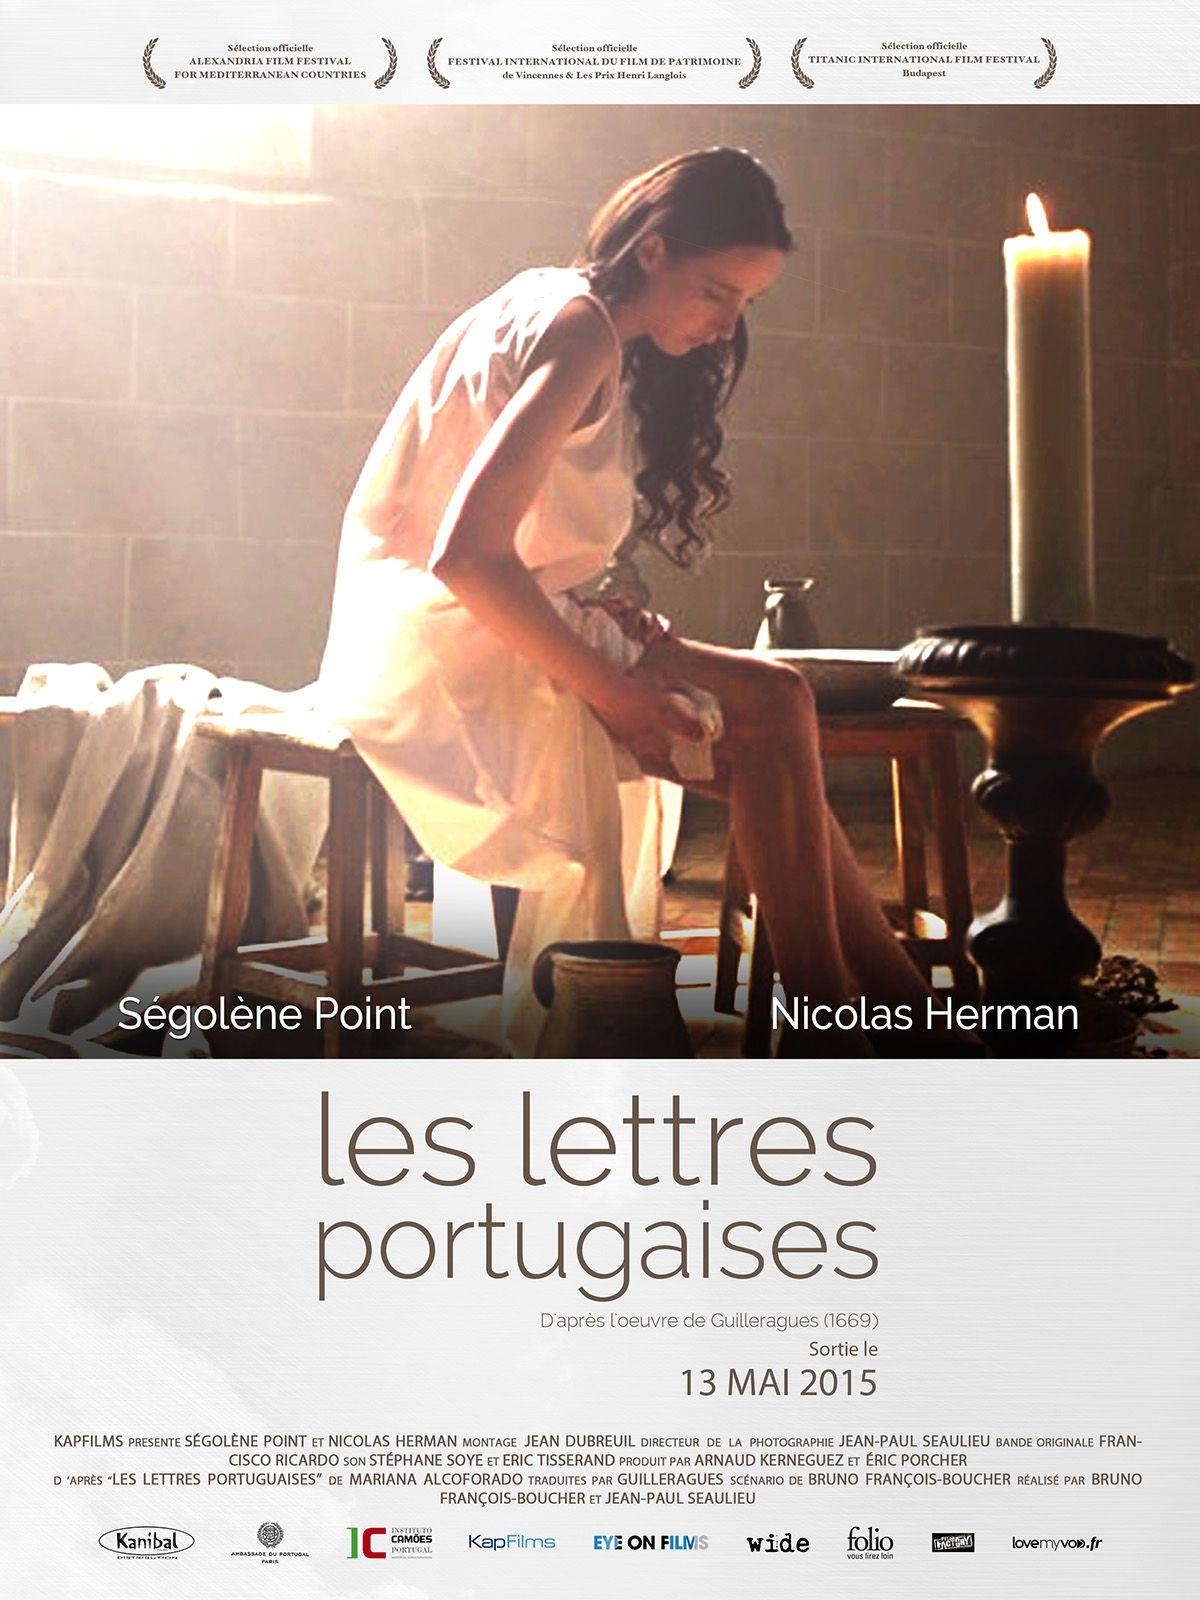 Les lettres portugaises - Film (2015)